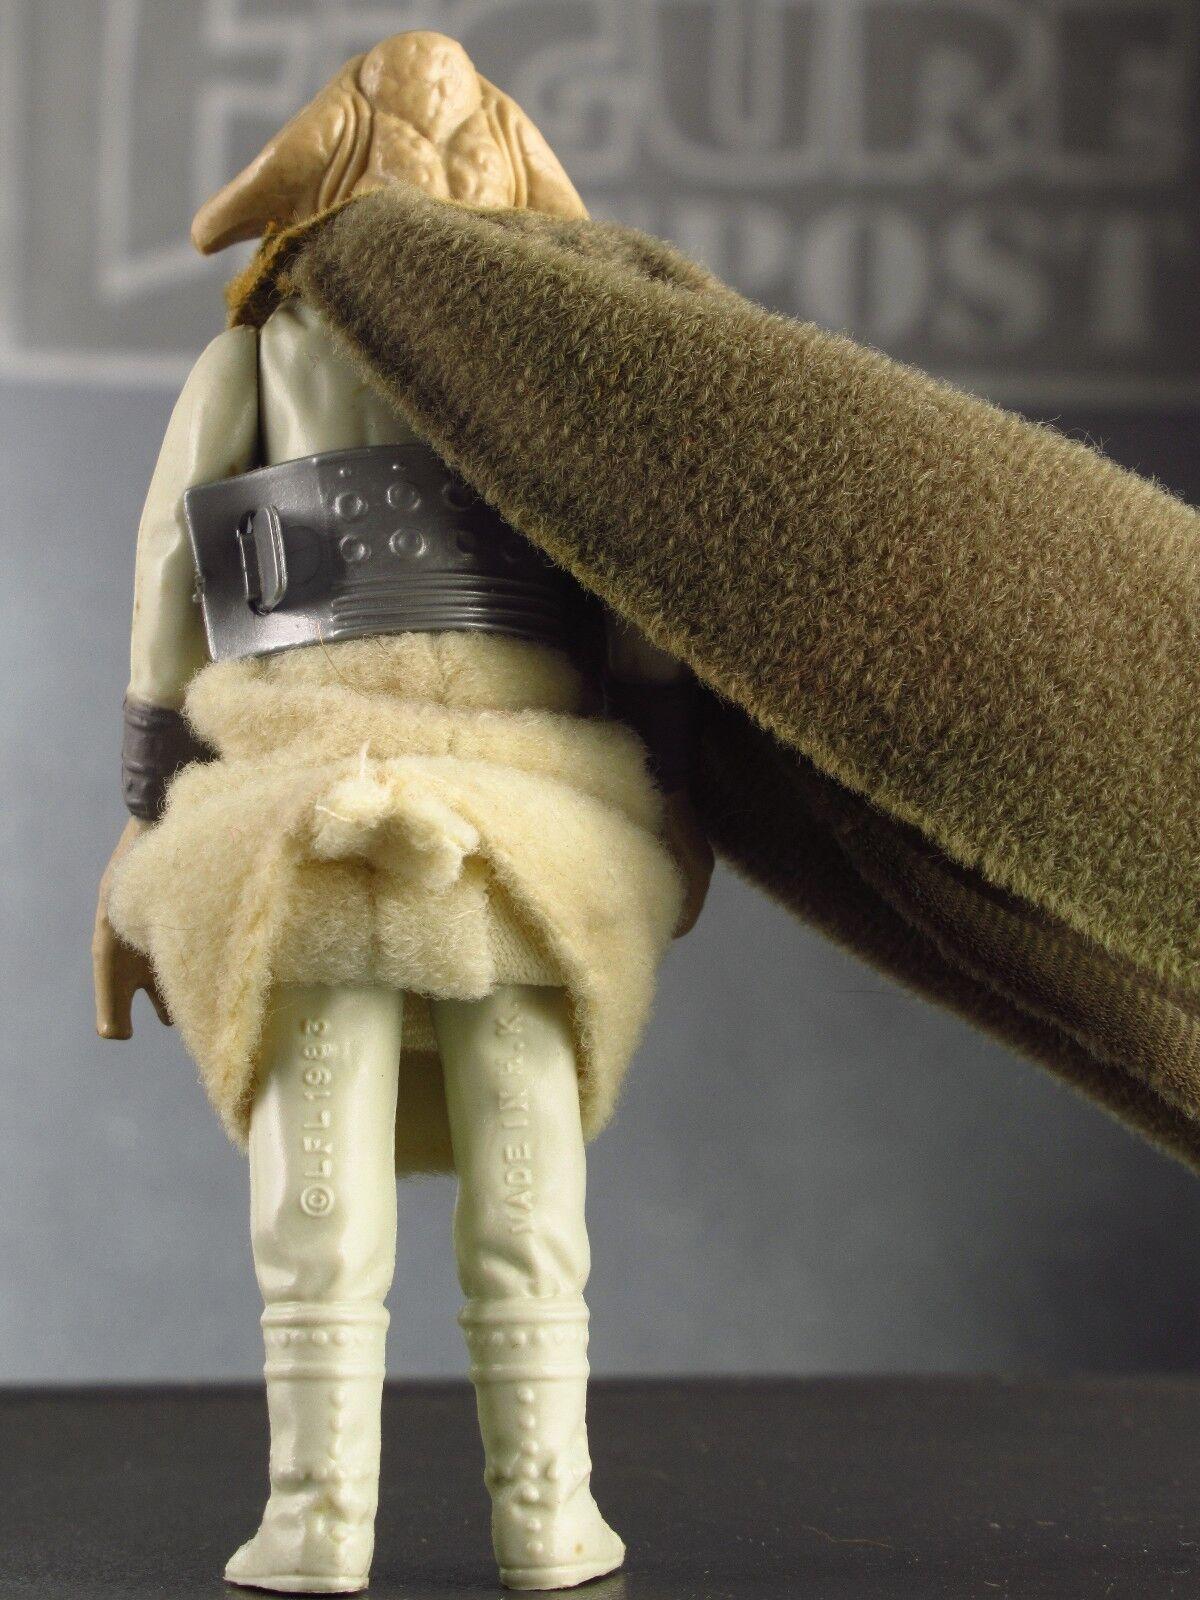 SQUID SQUID SQUID HEAD 1983 Vtg Star Wars redJ Action Figure Toy COMPLETE Jabba Alien Tessek fdf675